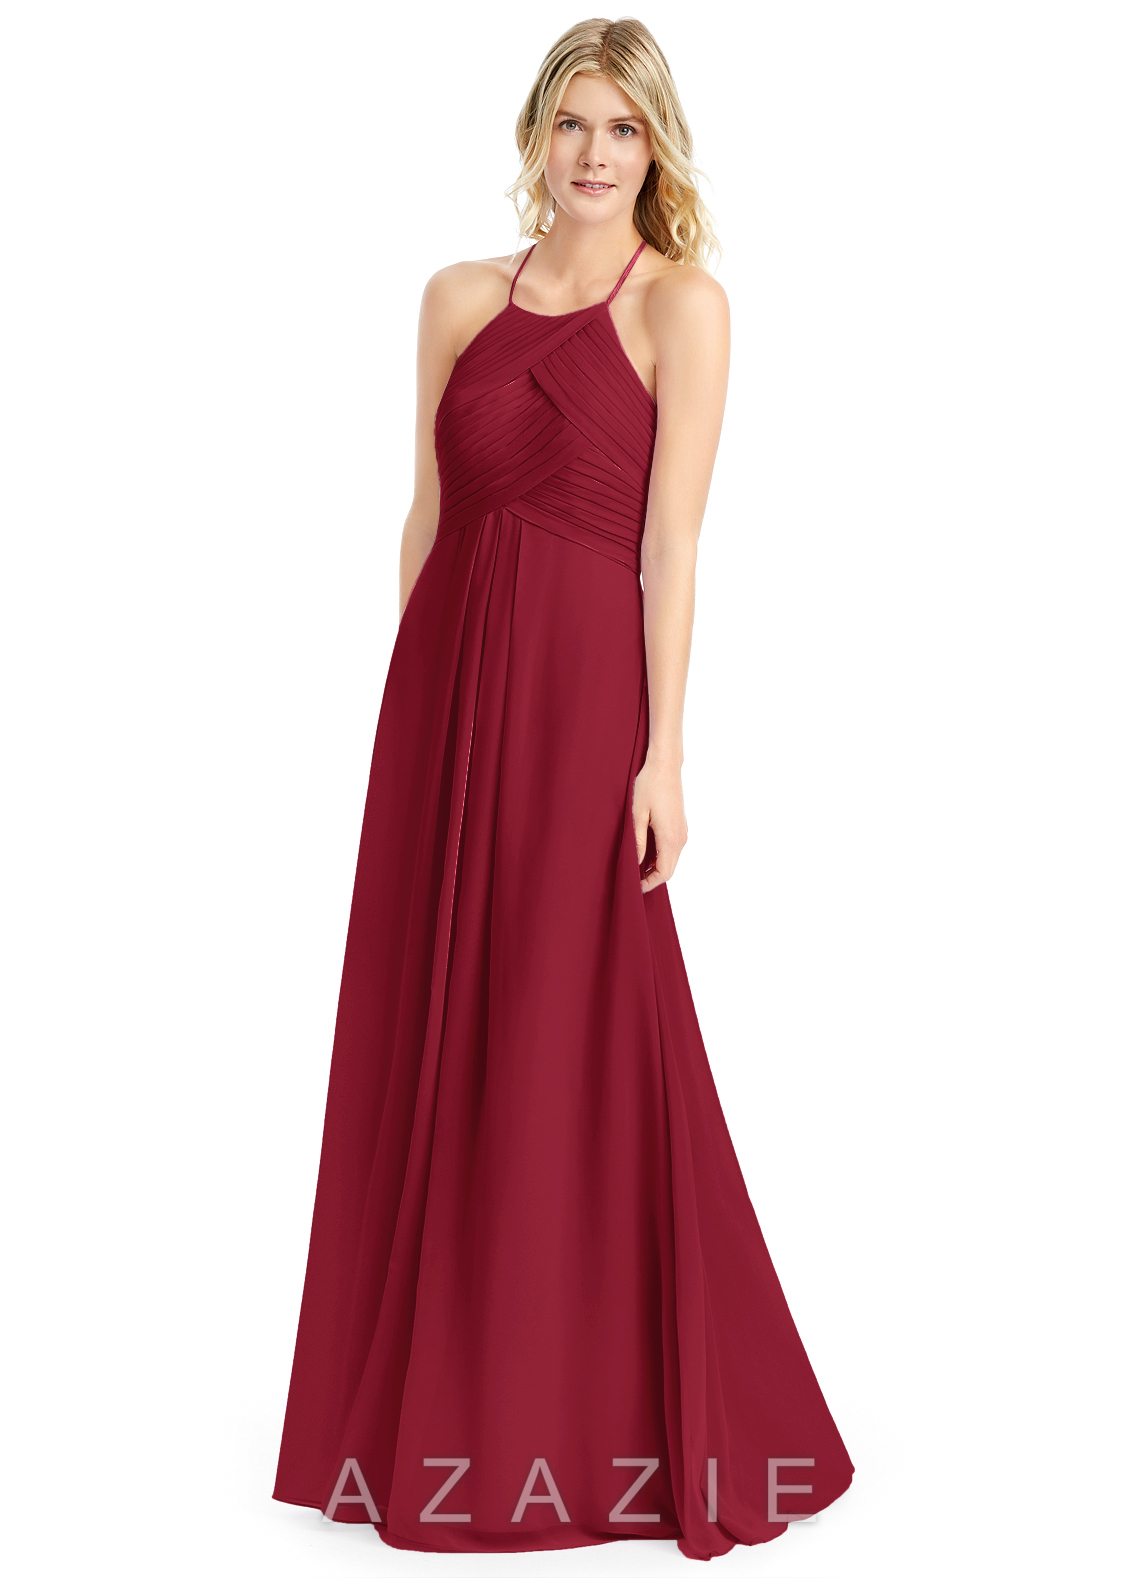 Wine Bridesmaid Dresses & Wine Gowns | Azazie